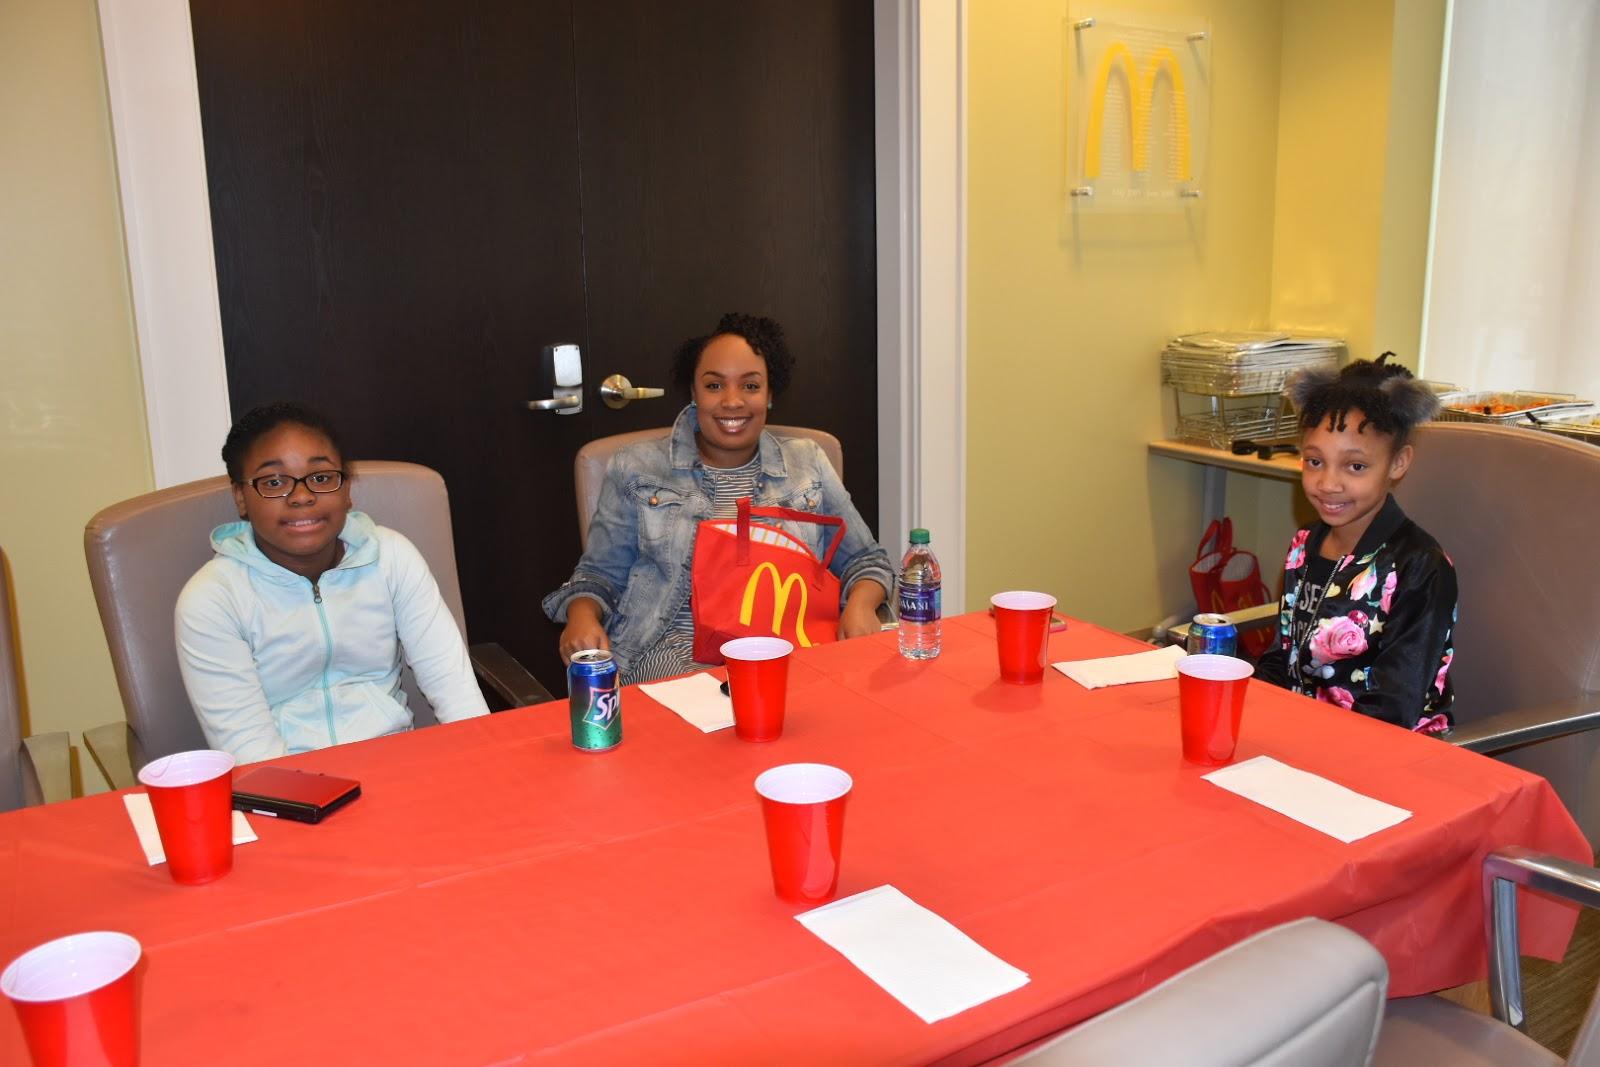 Keeping Families Together at Atlanta's Ronald McDonald House Charities  via  www.productreviewmom.com